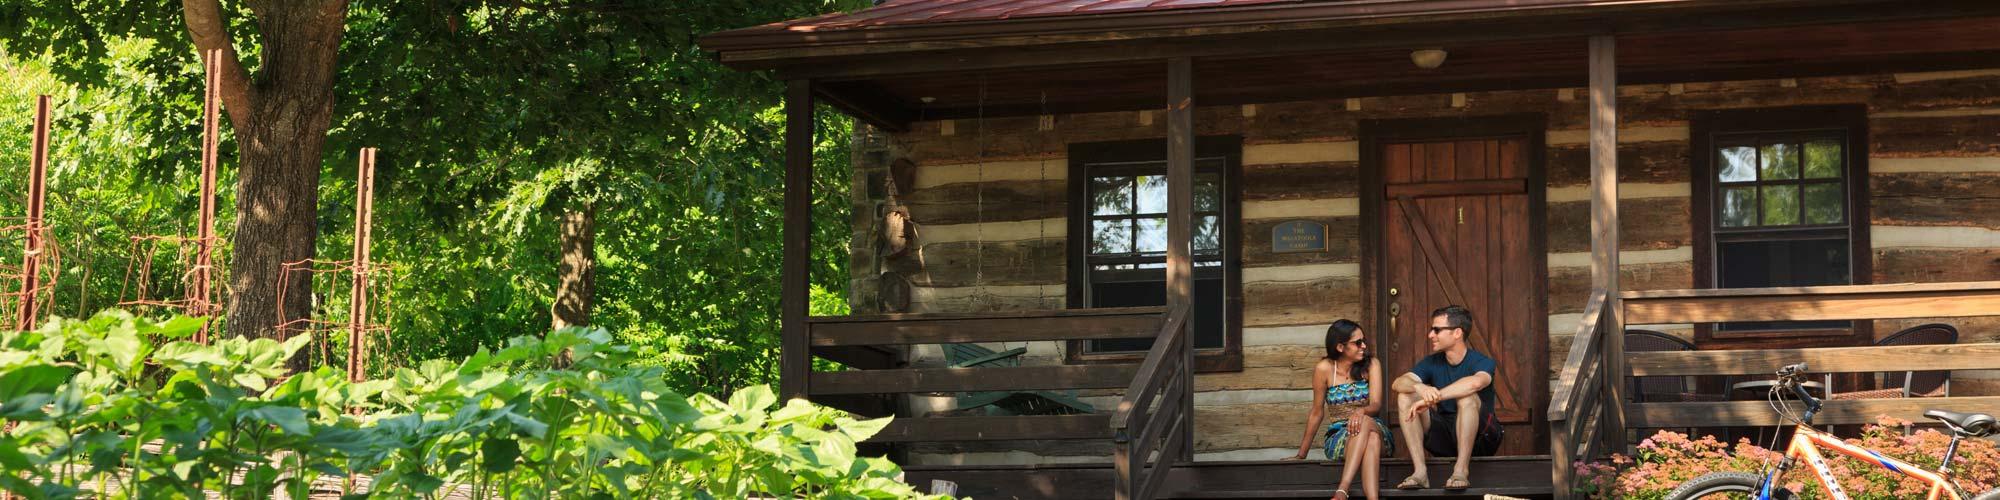 Fort Lewis Lodge  Bath County Virginia Inn, Bu0026B, Cabins And Restaurant    Lodging In Hot Springs, Warm Springs, Blue Ridge Mountains